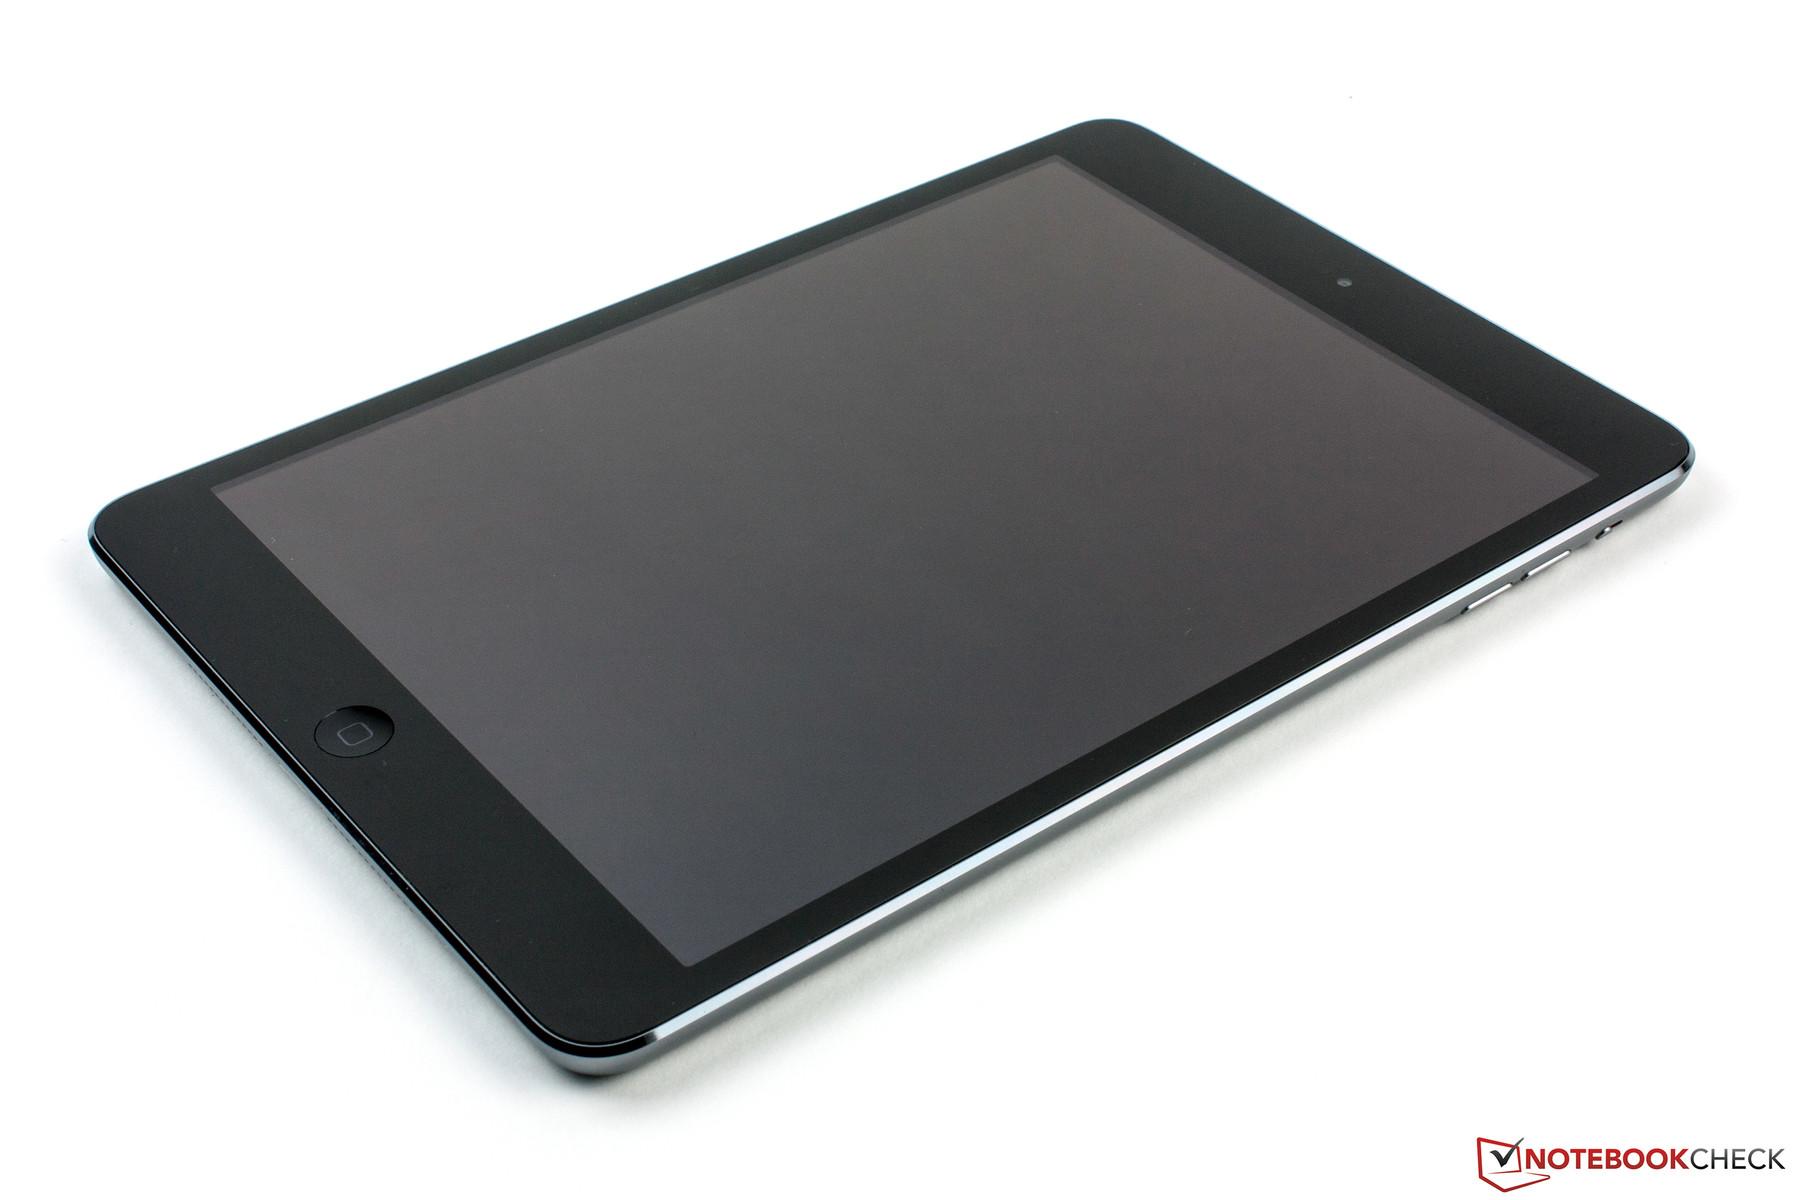 courte critique de la tablette apple ipad mini retina. Black Bedroom Furniture Sets. Home Design Ideas